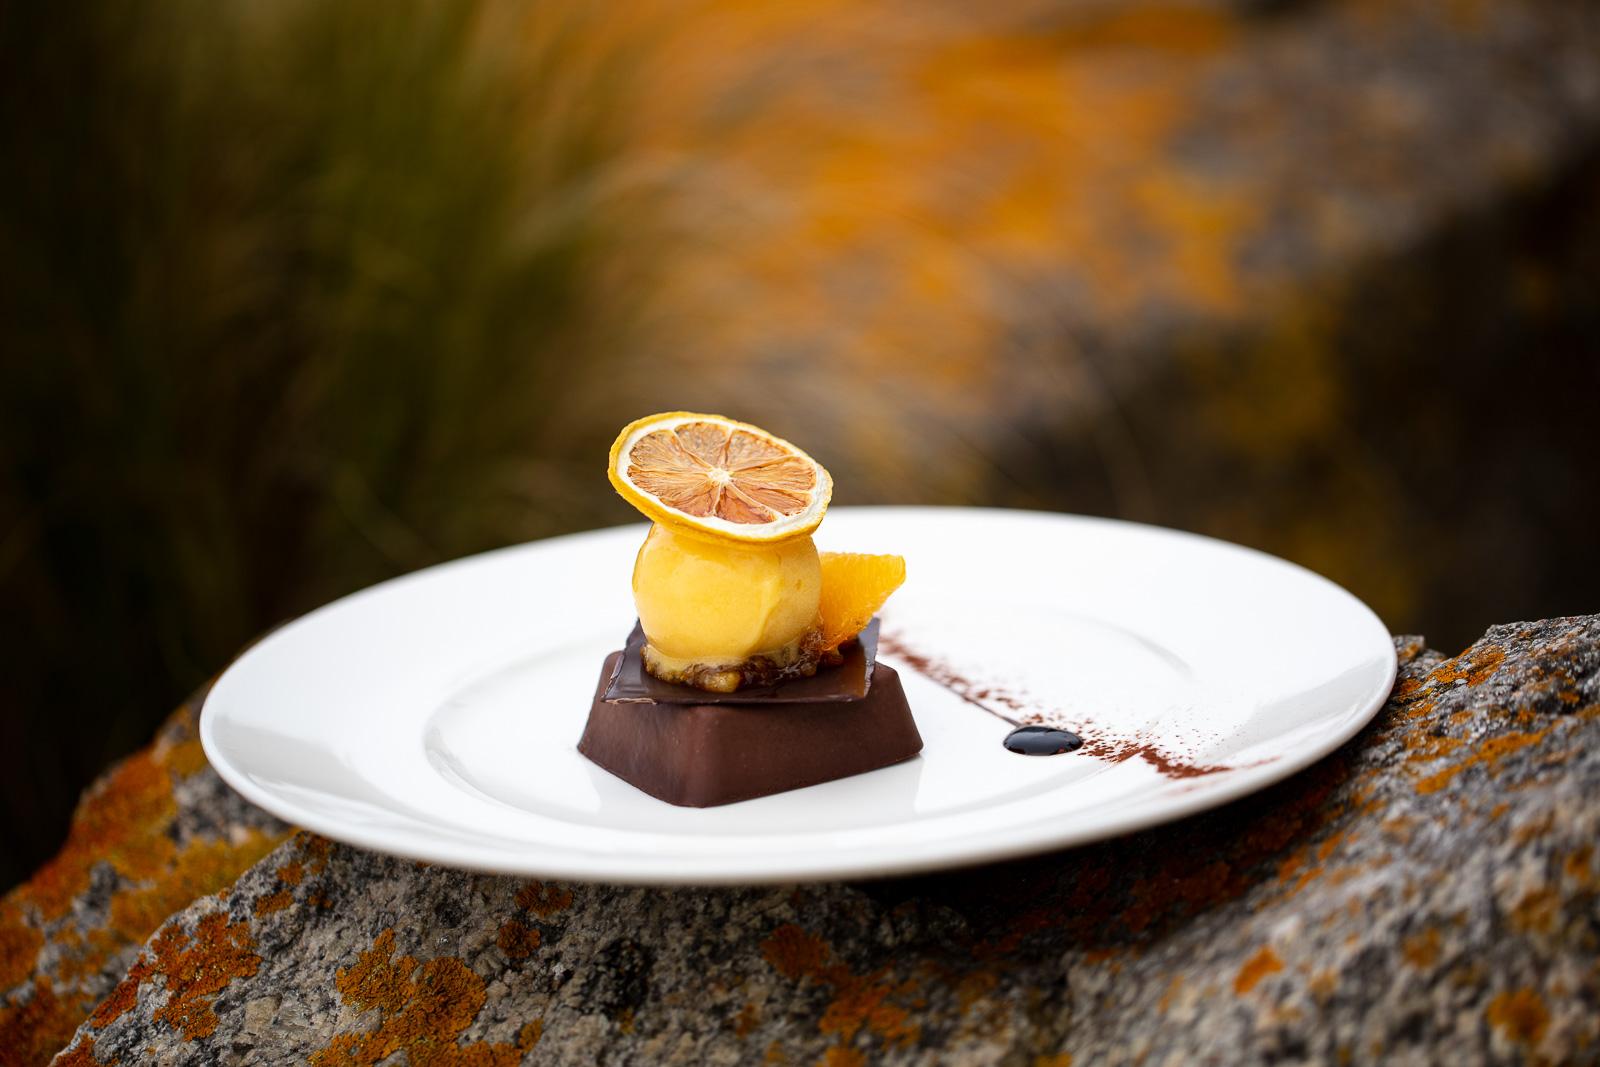 Franck_Hamel_Sofitel_Quiberon_valerie_paumelle_agent-photographe_culinaire-foodphotographer (7).jpg